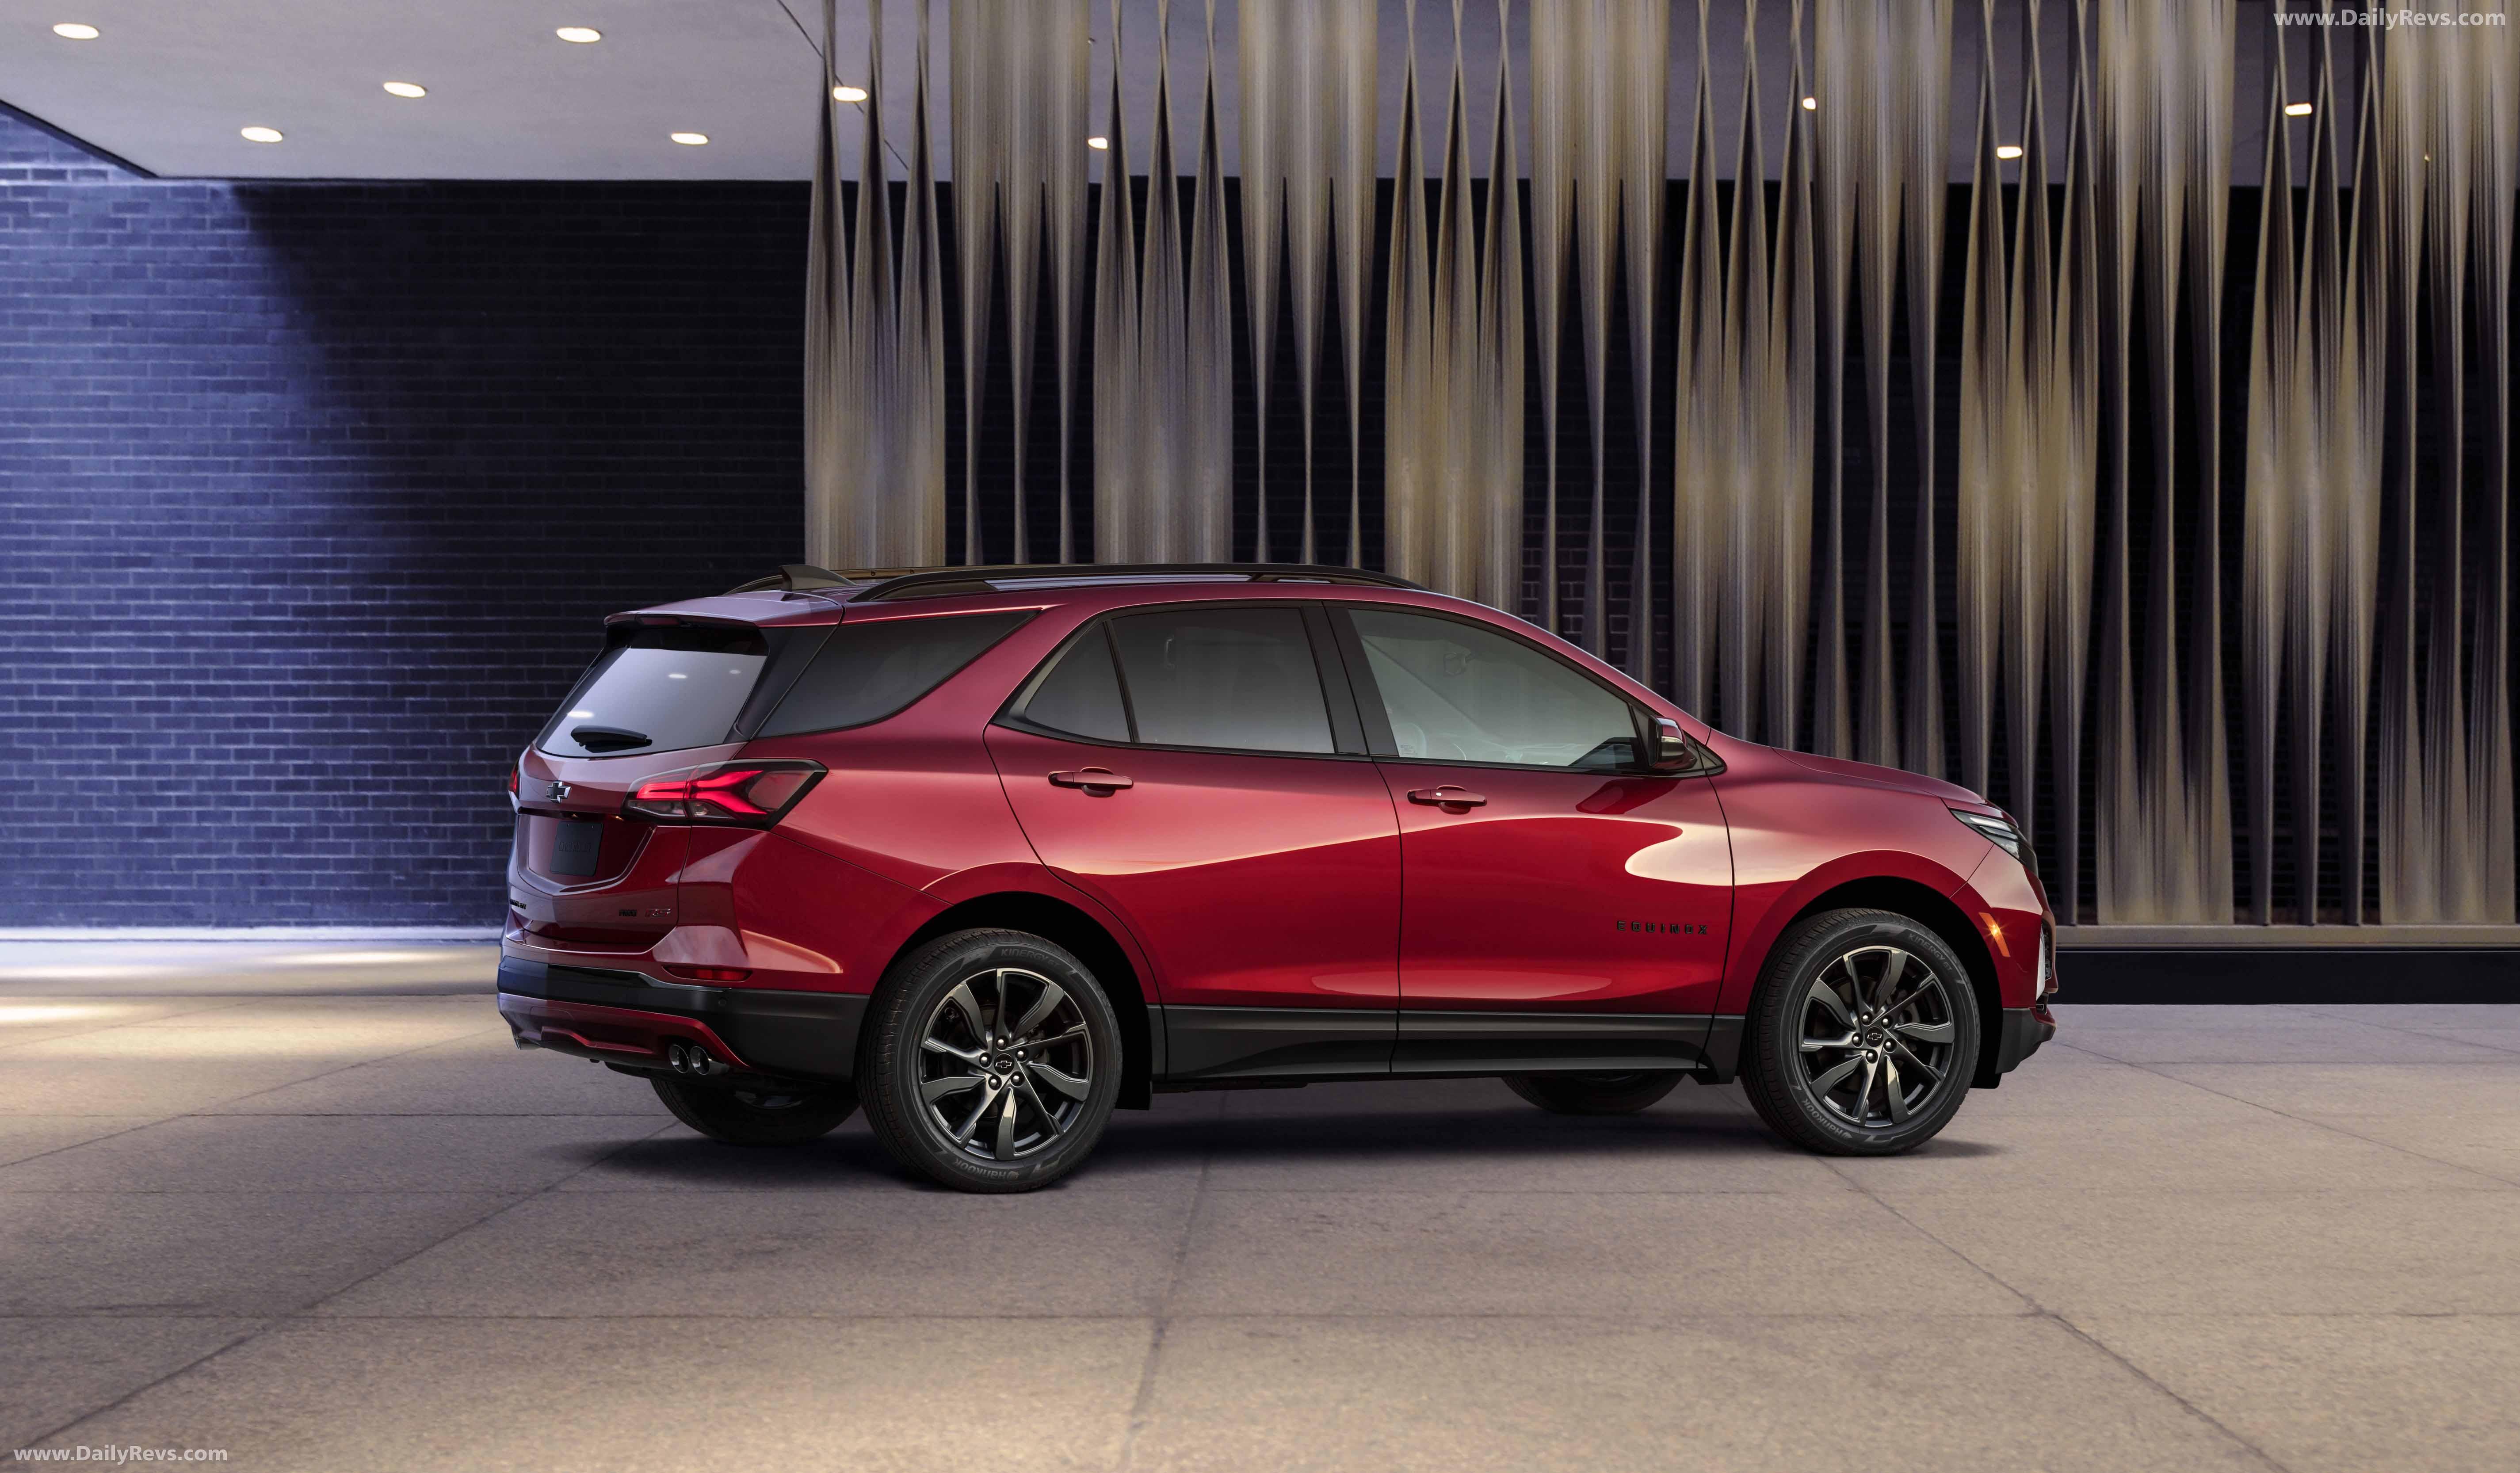 2021 Chevrolet Equinox - HD Pictures, Videos, Specs ...